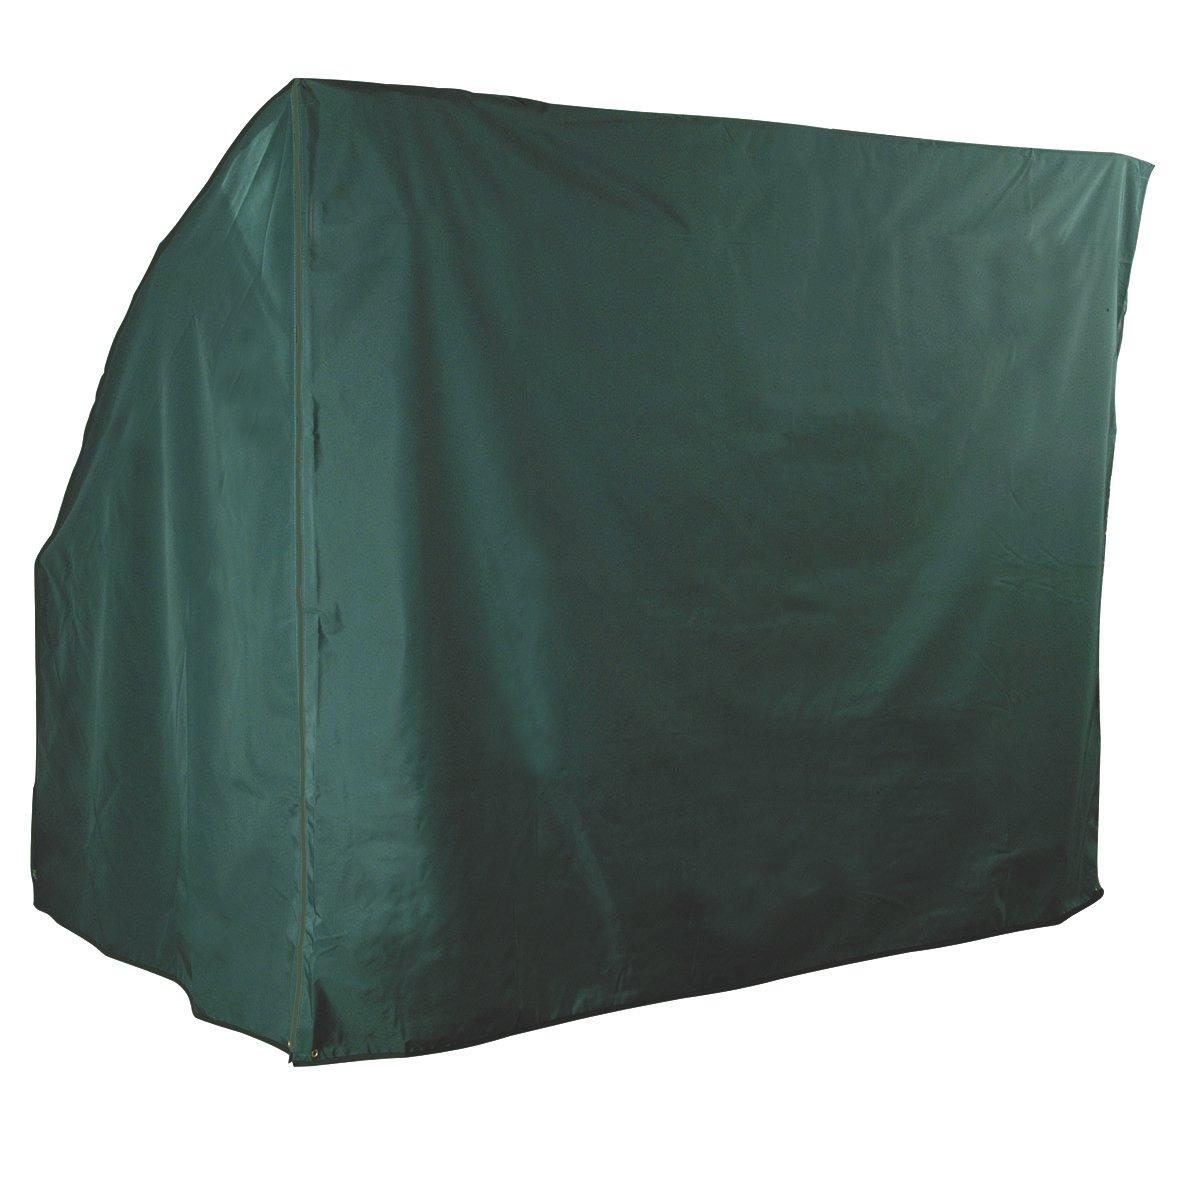 Bosmere C505 Premium Hammock Cover  Amazon.co.uk  Garden   Outdoors 5e5eab31b4859